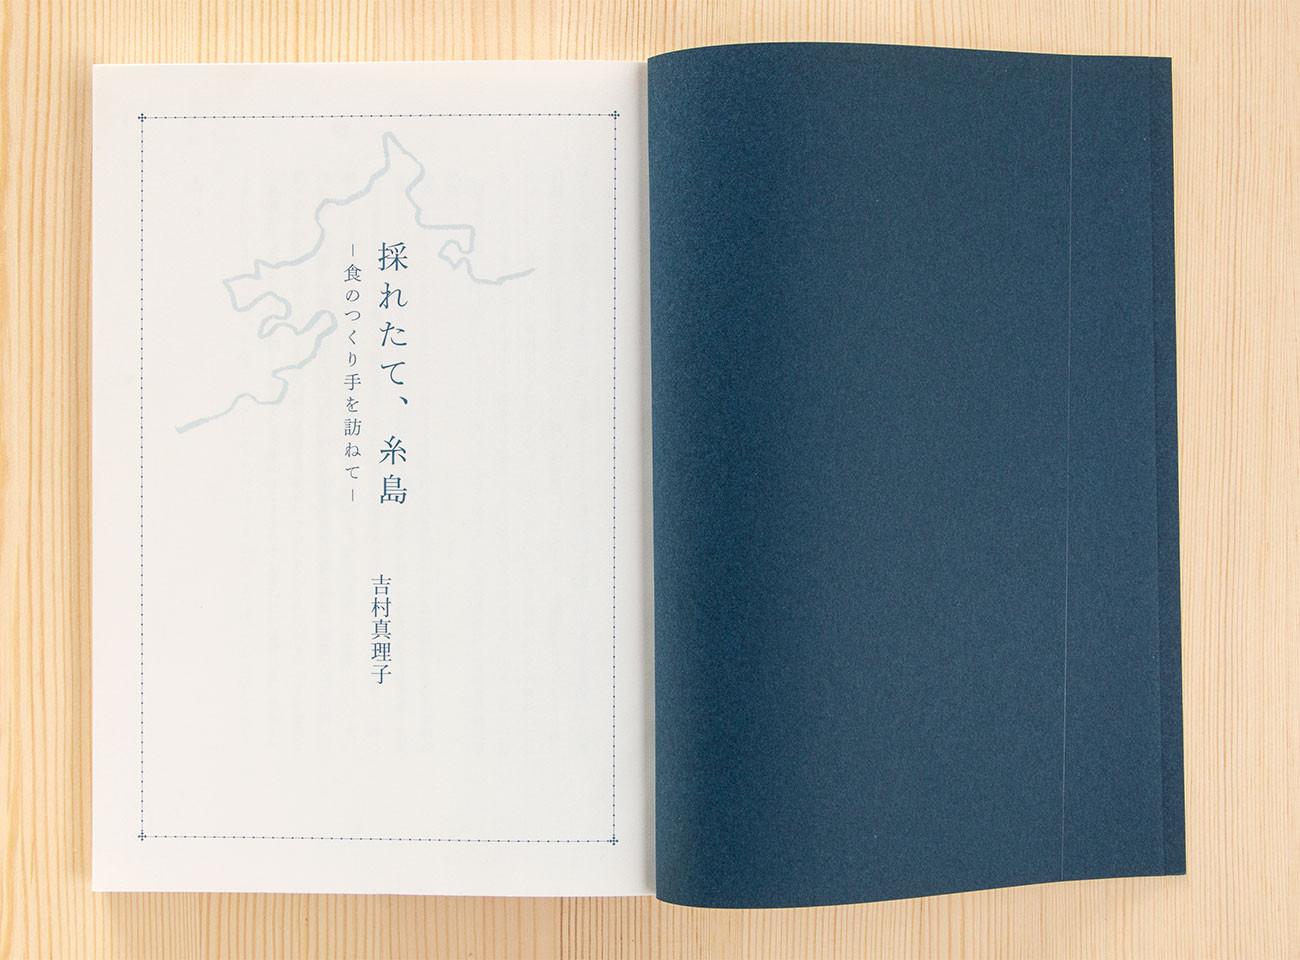 2011_Itoshima_IMG_1732.jpg